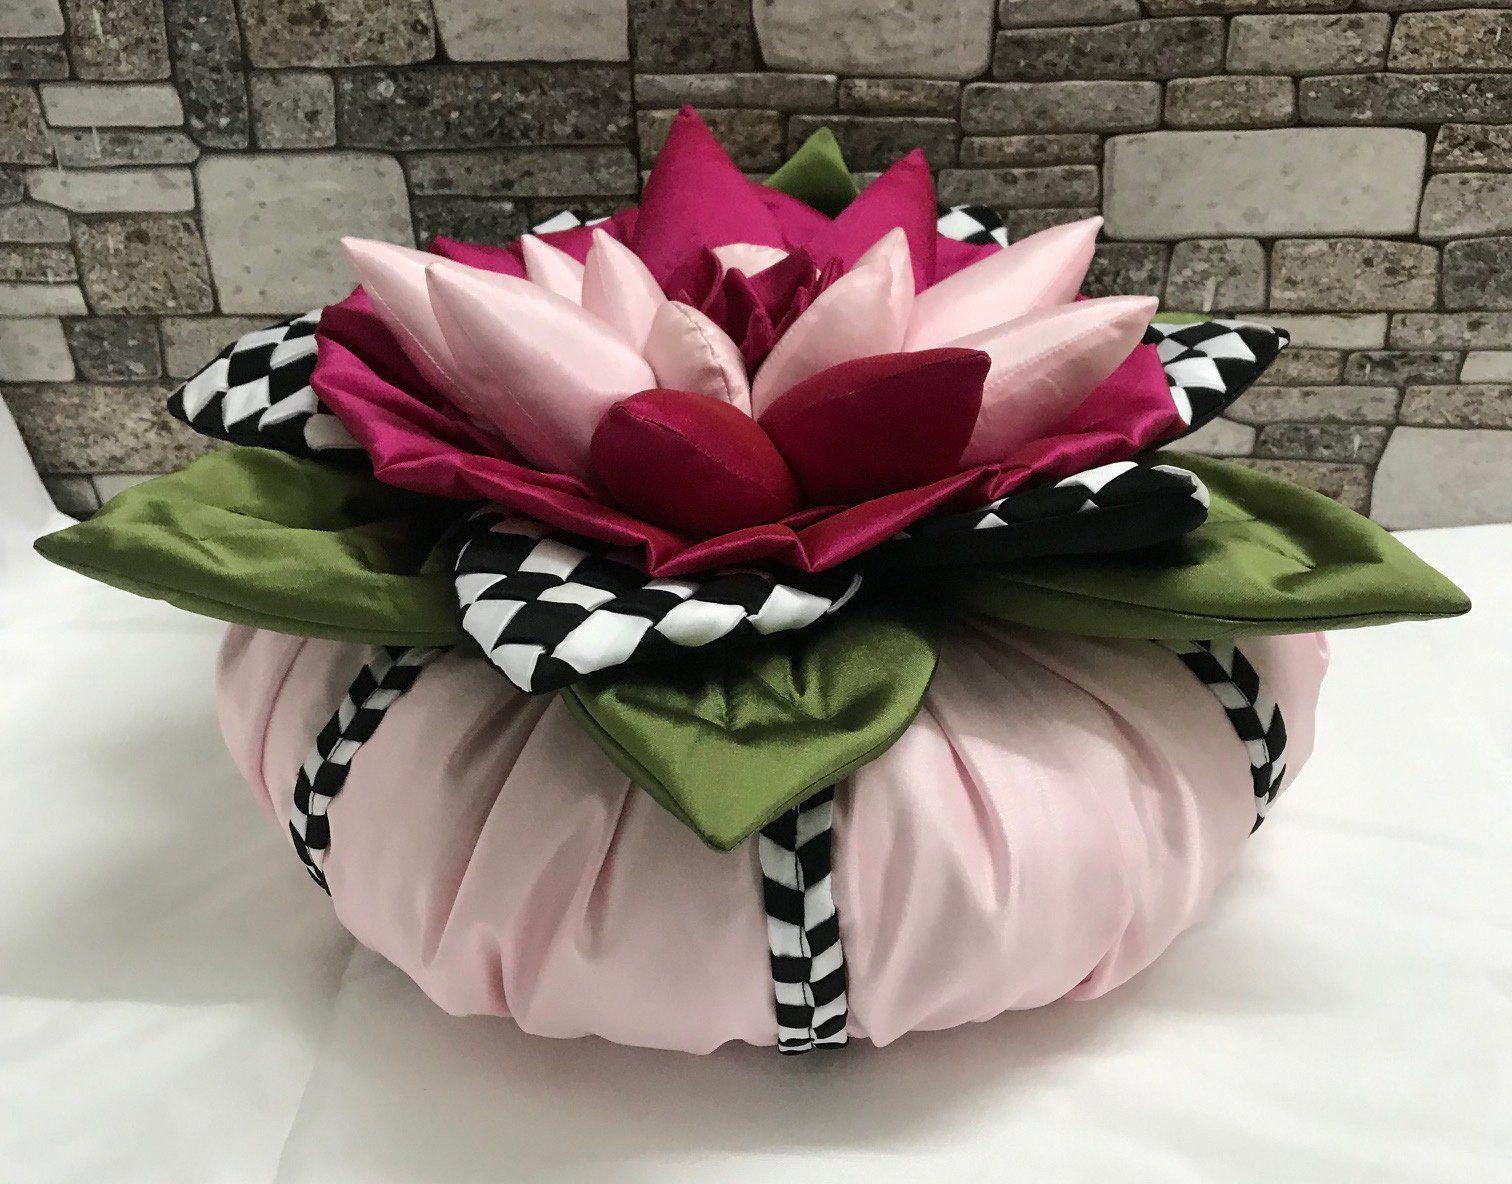 Pink Throw Pillows Stranger Things Round Pillow Home Decor Pillows Flower Boho Gift retro pillow Sunflower Pink